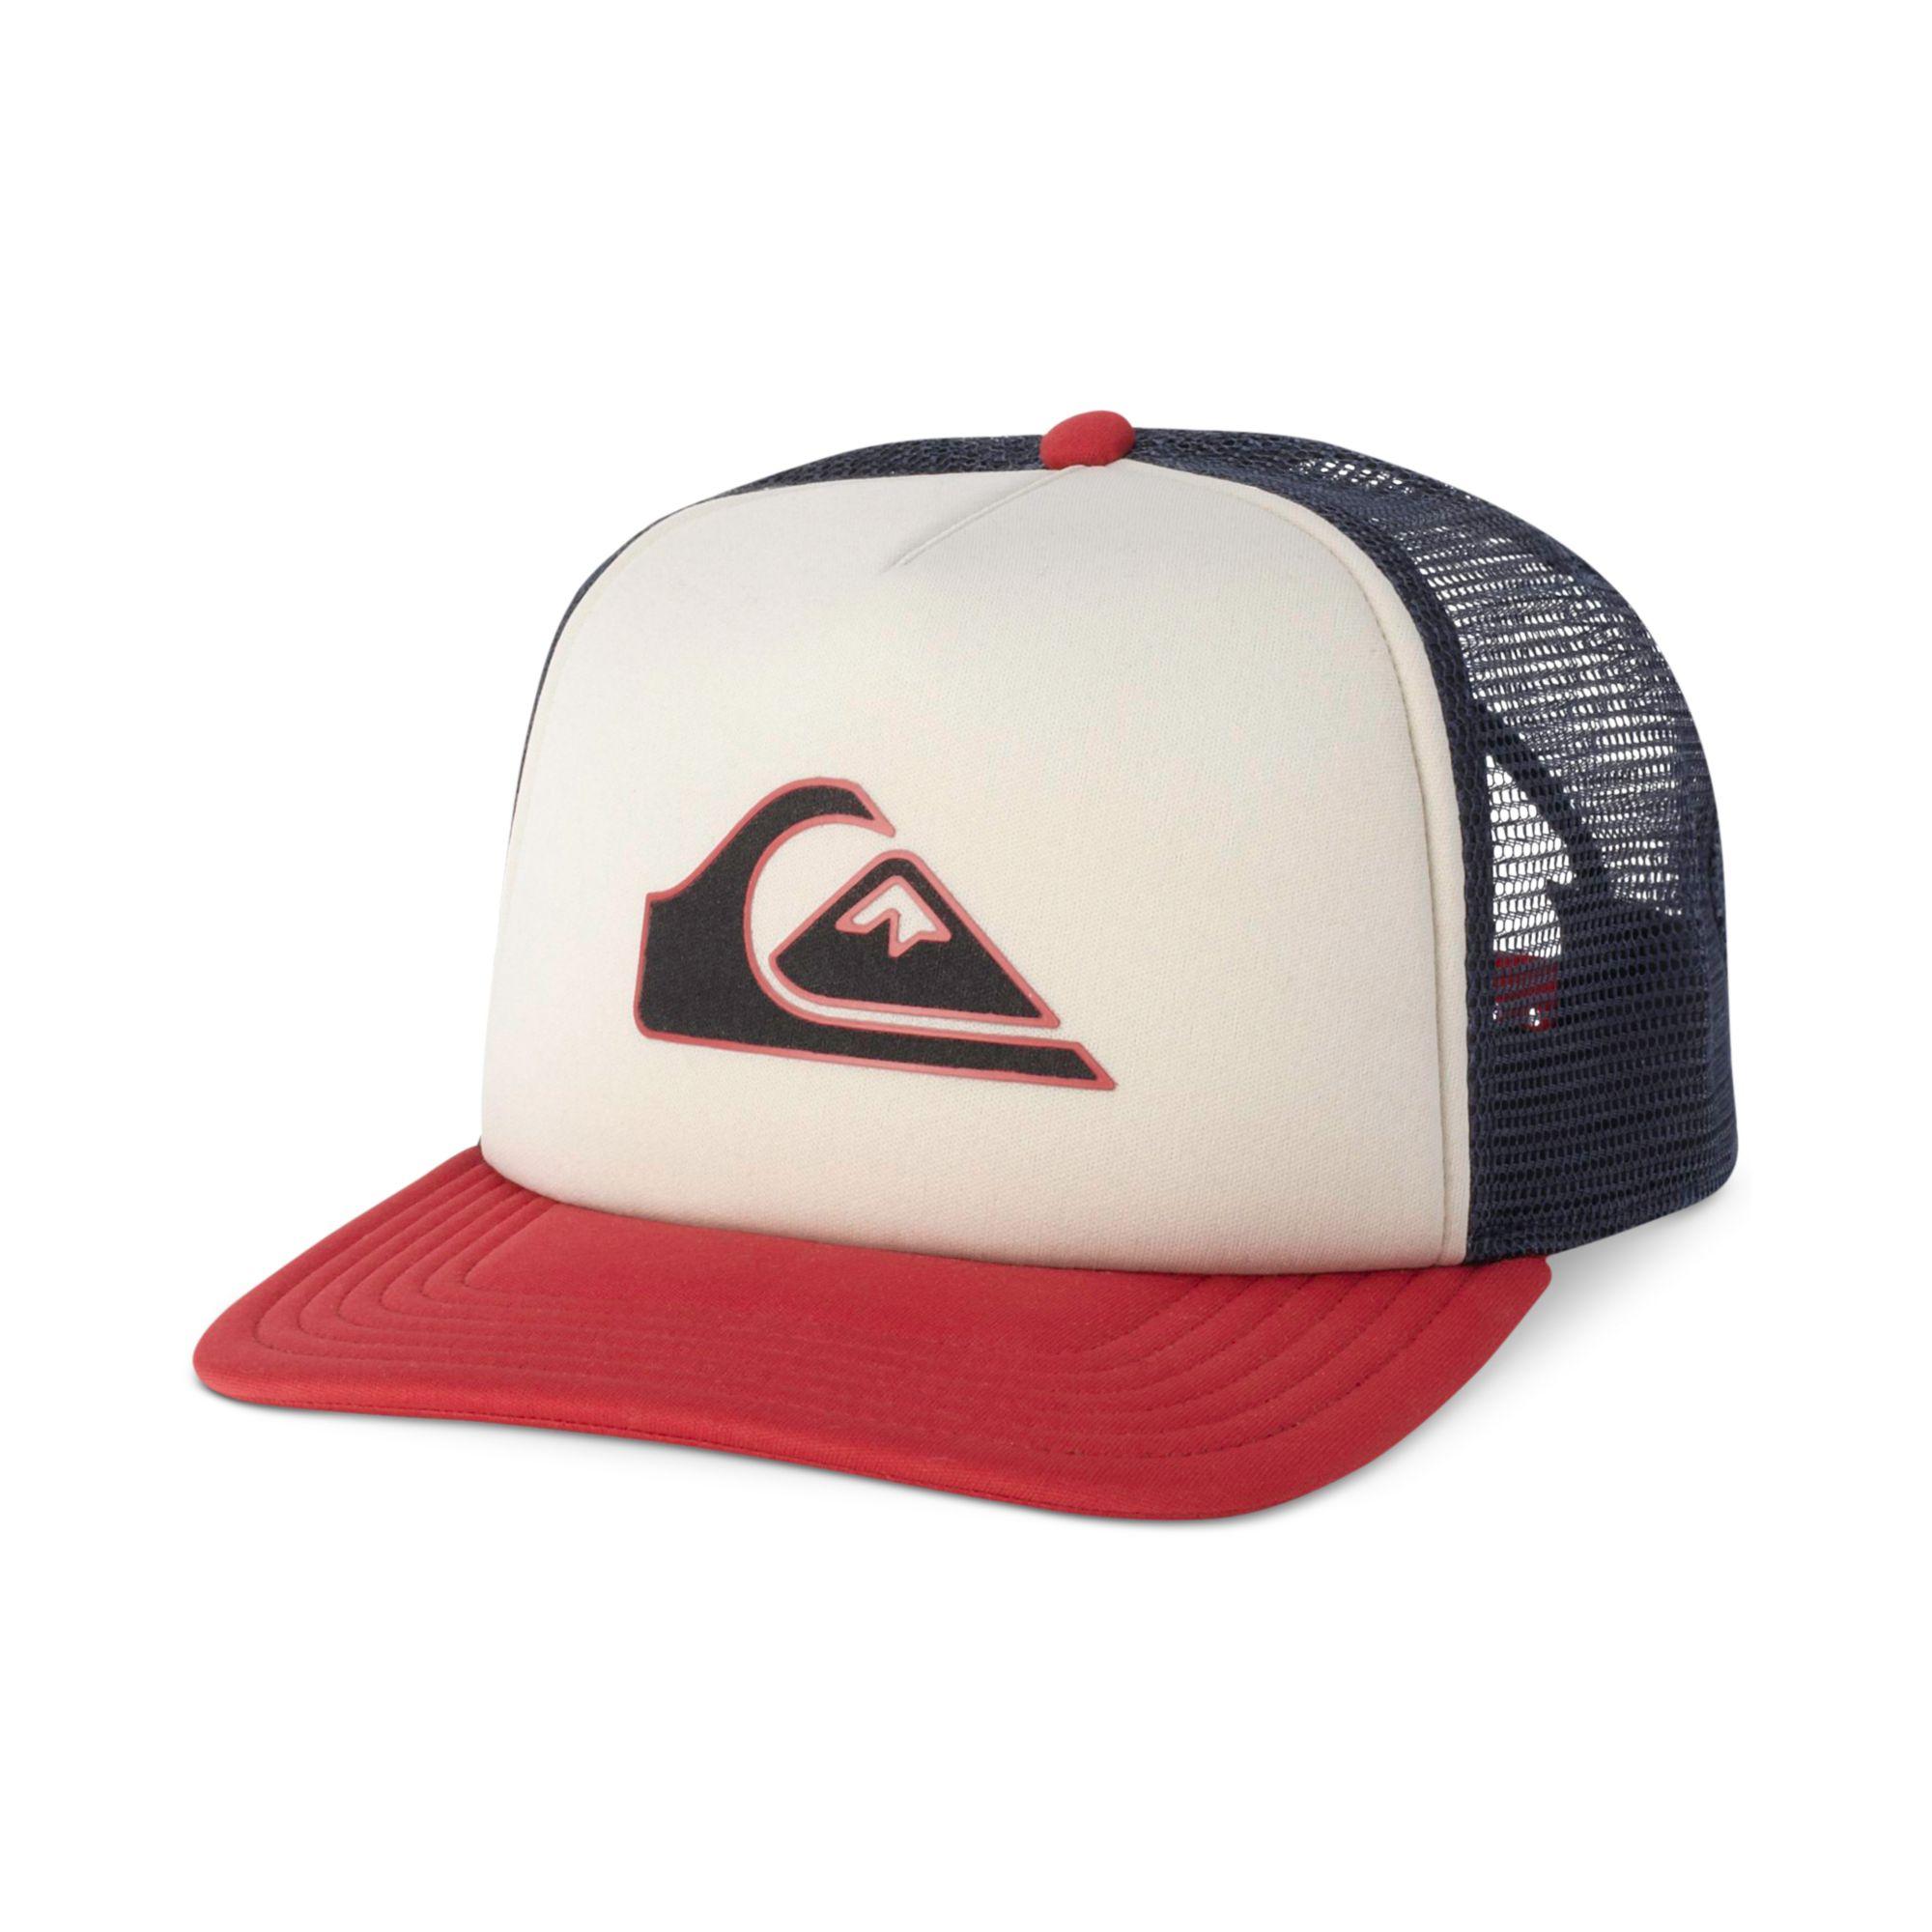 8f5cb8bd0f25b ... greece lyst quiksilver threve mesh trucker hat in white for men 0a884  ce866